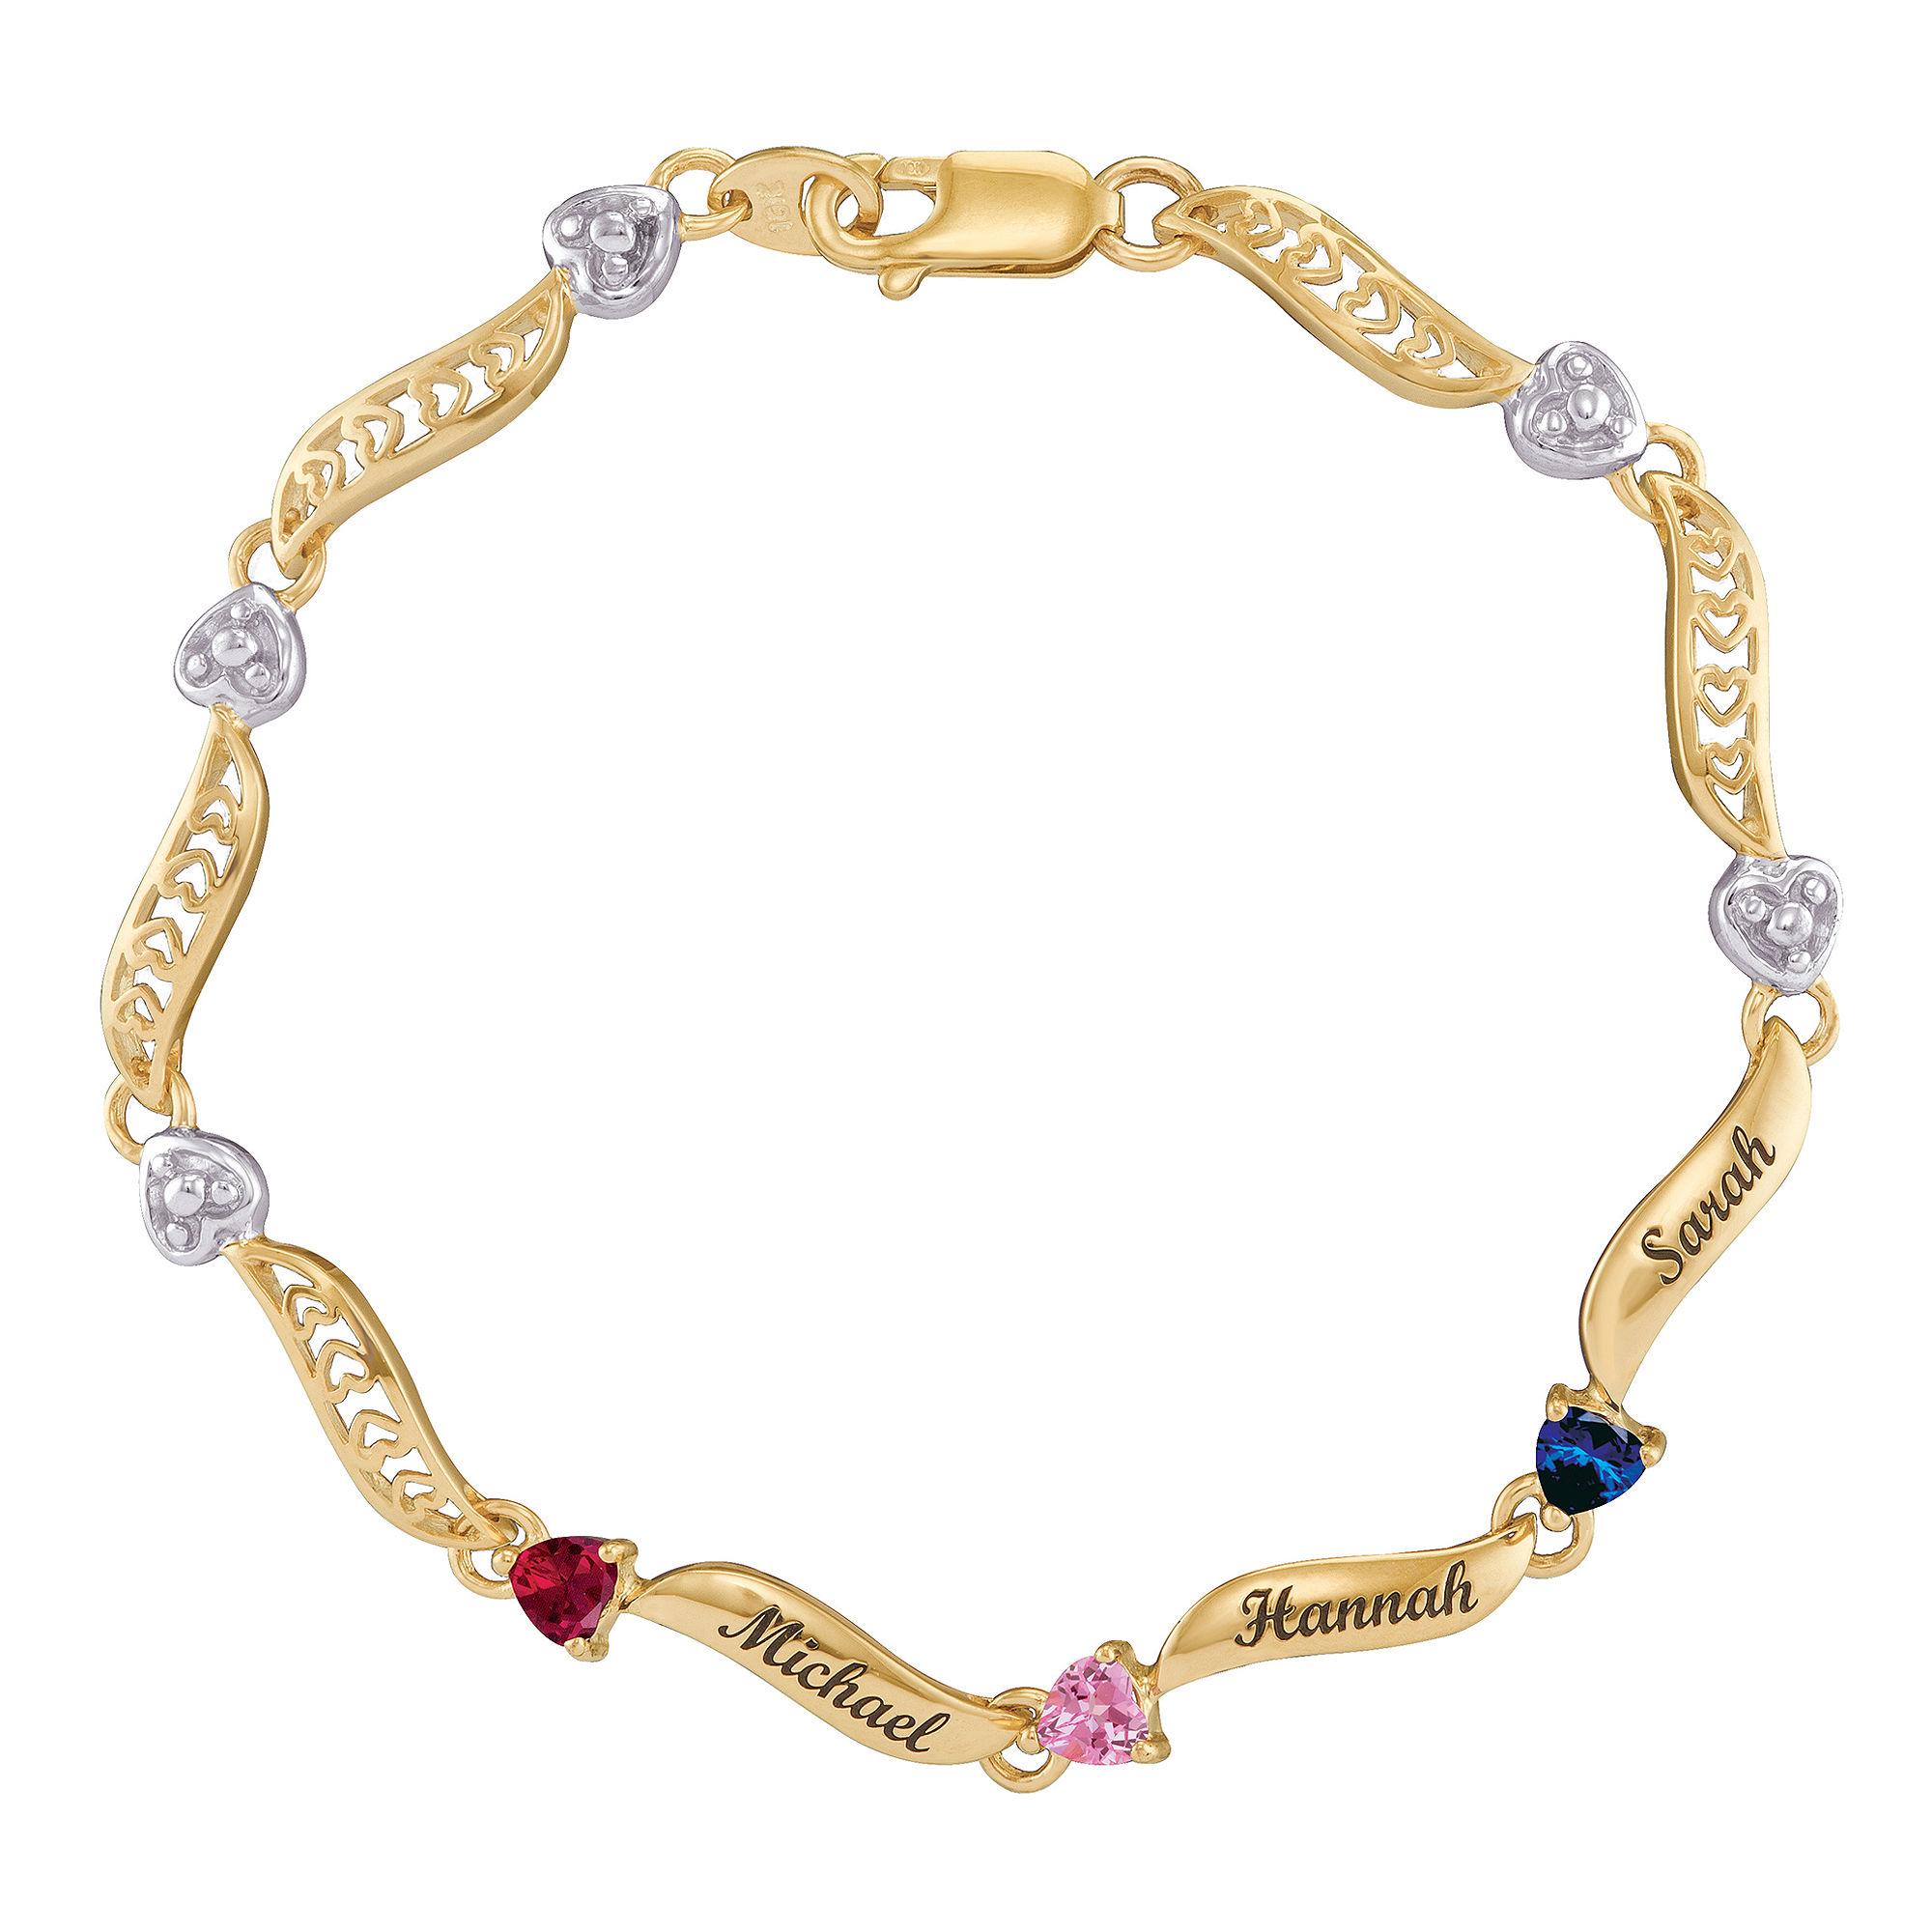 Personalized 10K Yellow Gold Family Birthstone Heart Bracelet